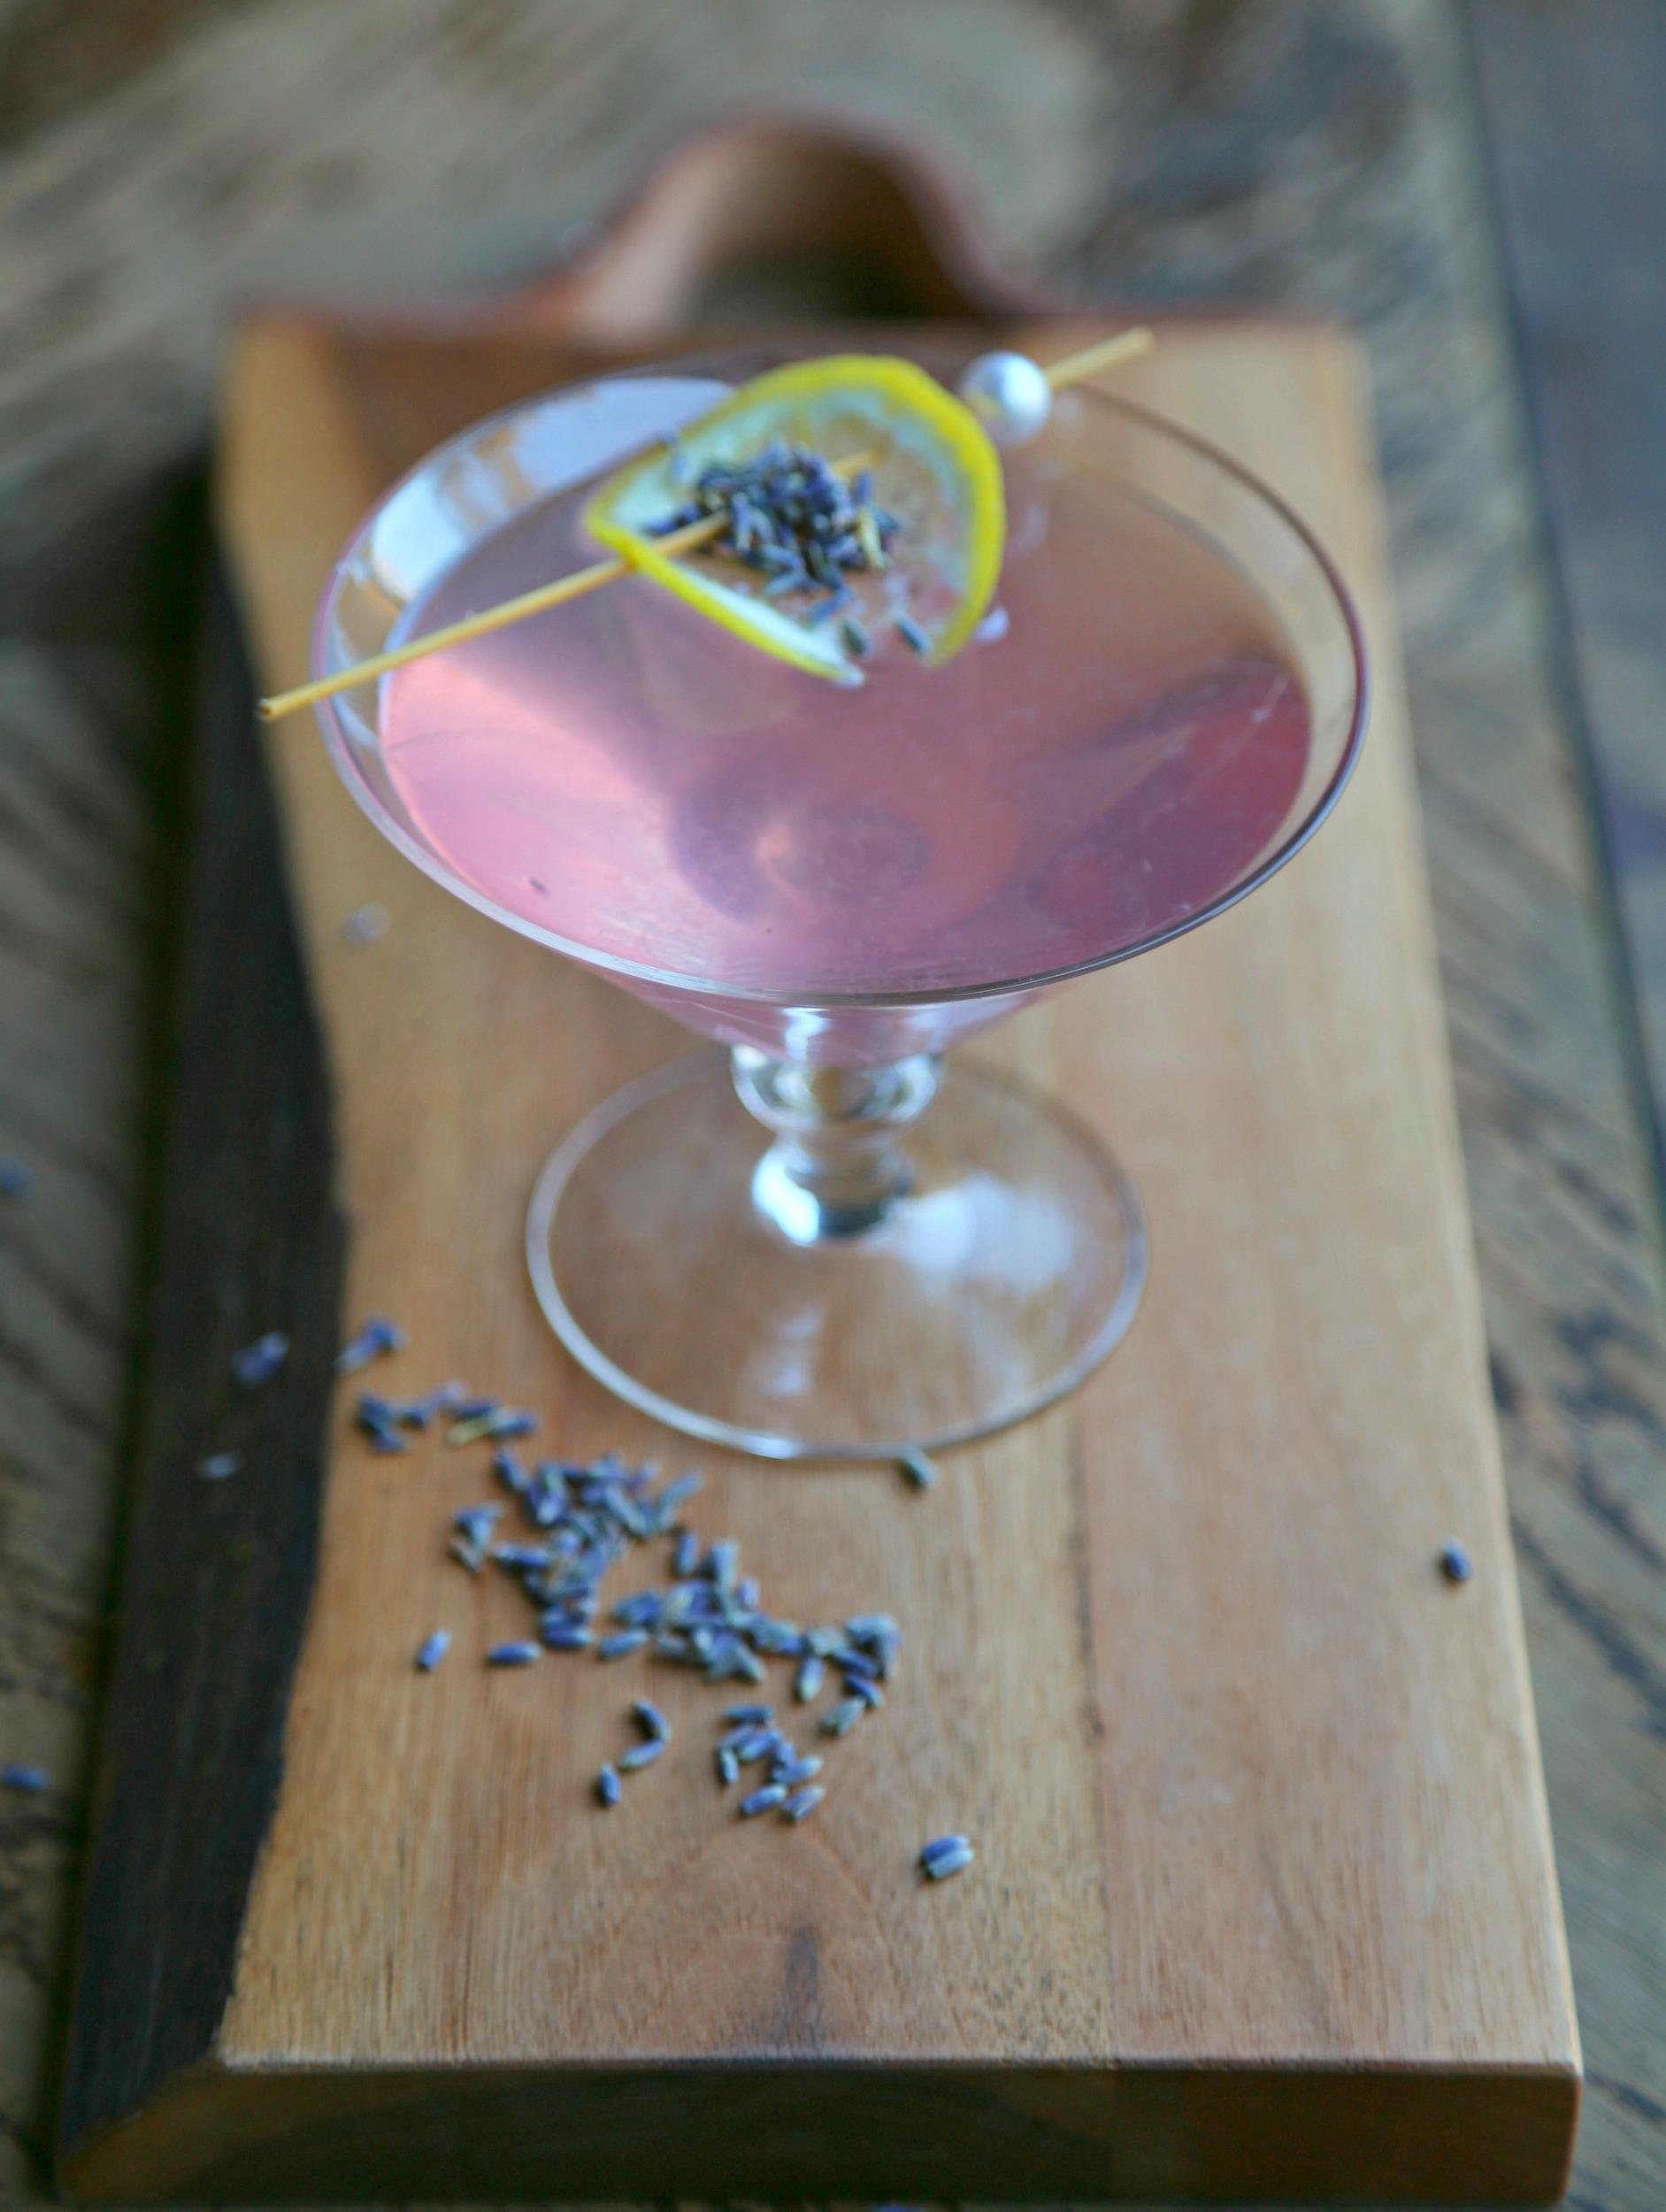 lavender-martini-vodka-cocktail-vianneyrodriguez-sweetlifebake